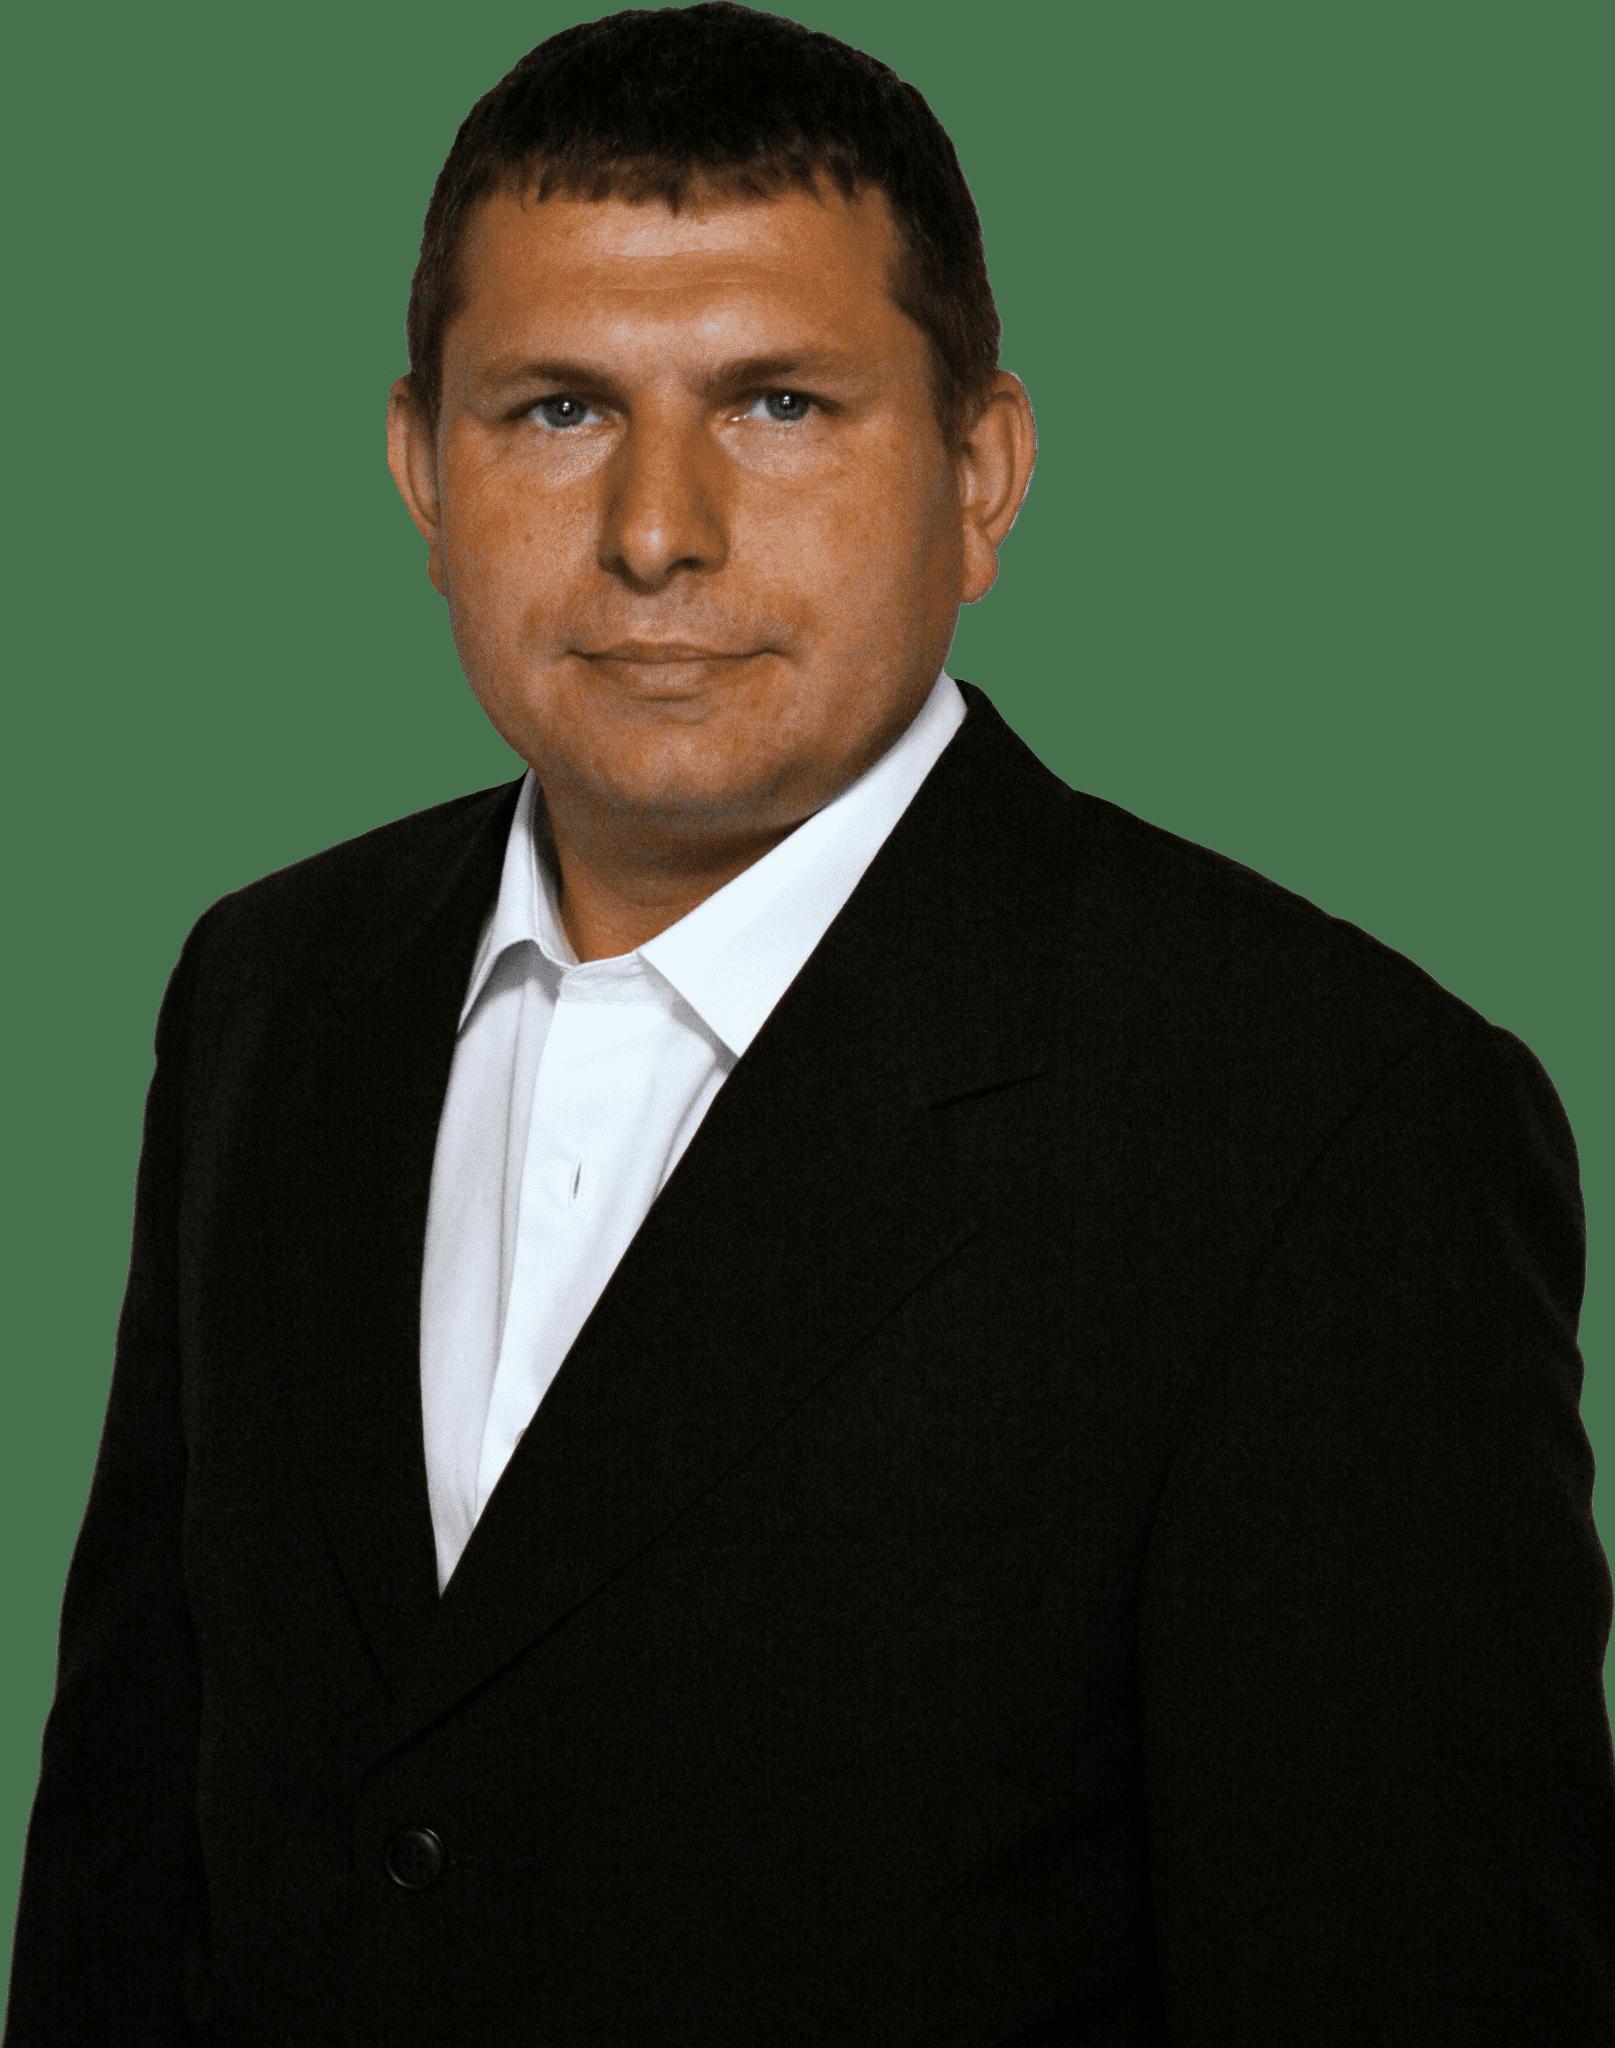 Jaroslav Marsa